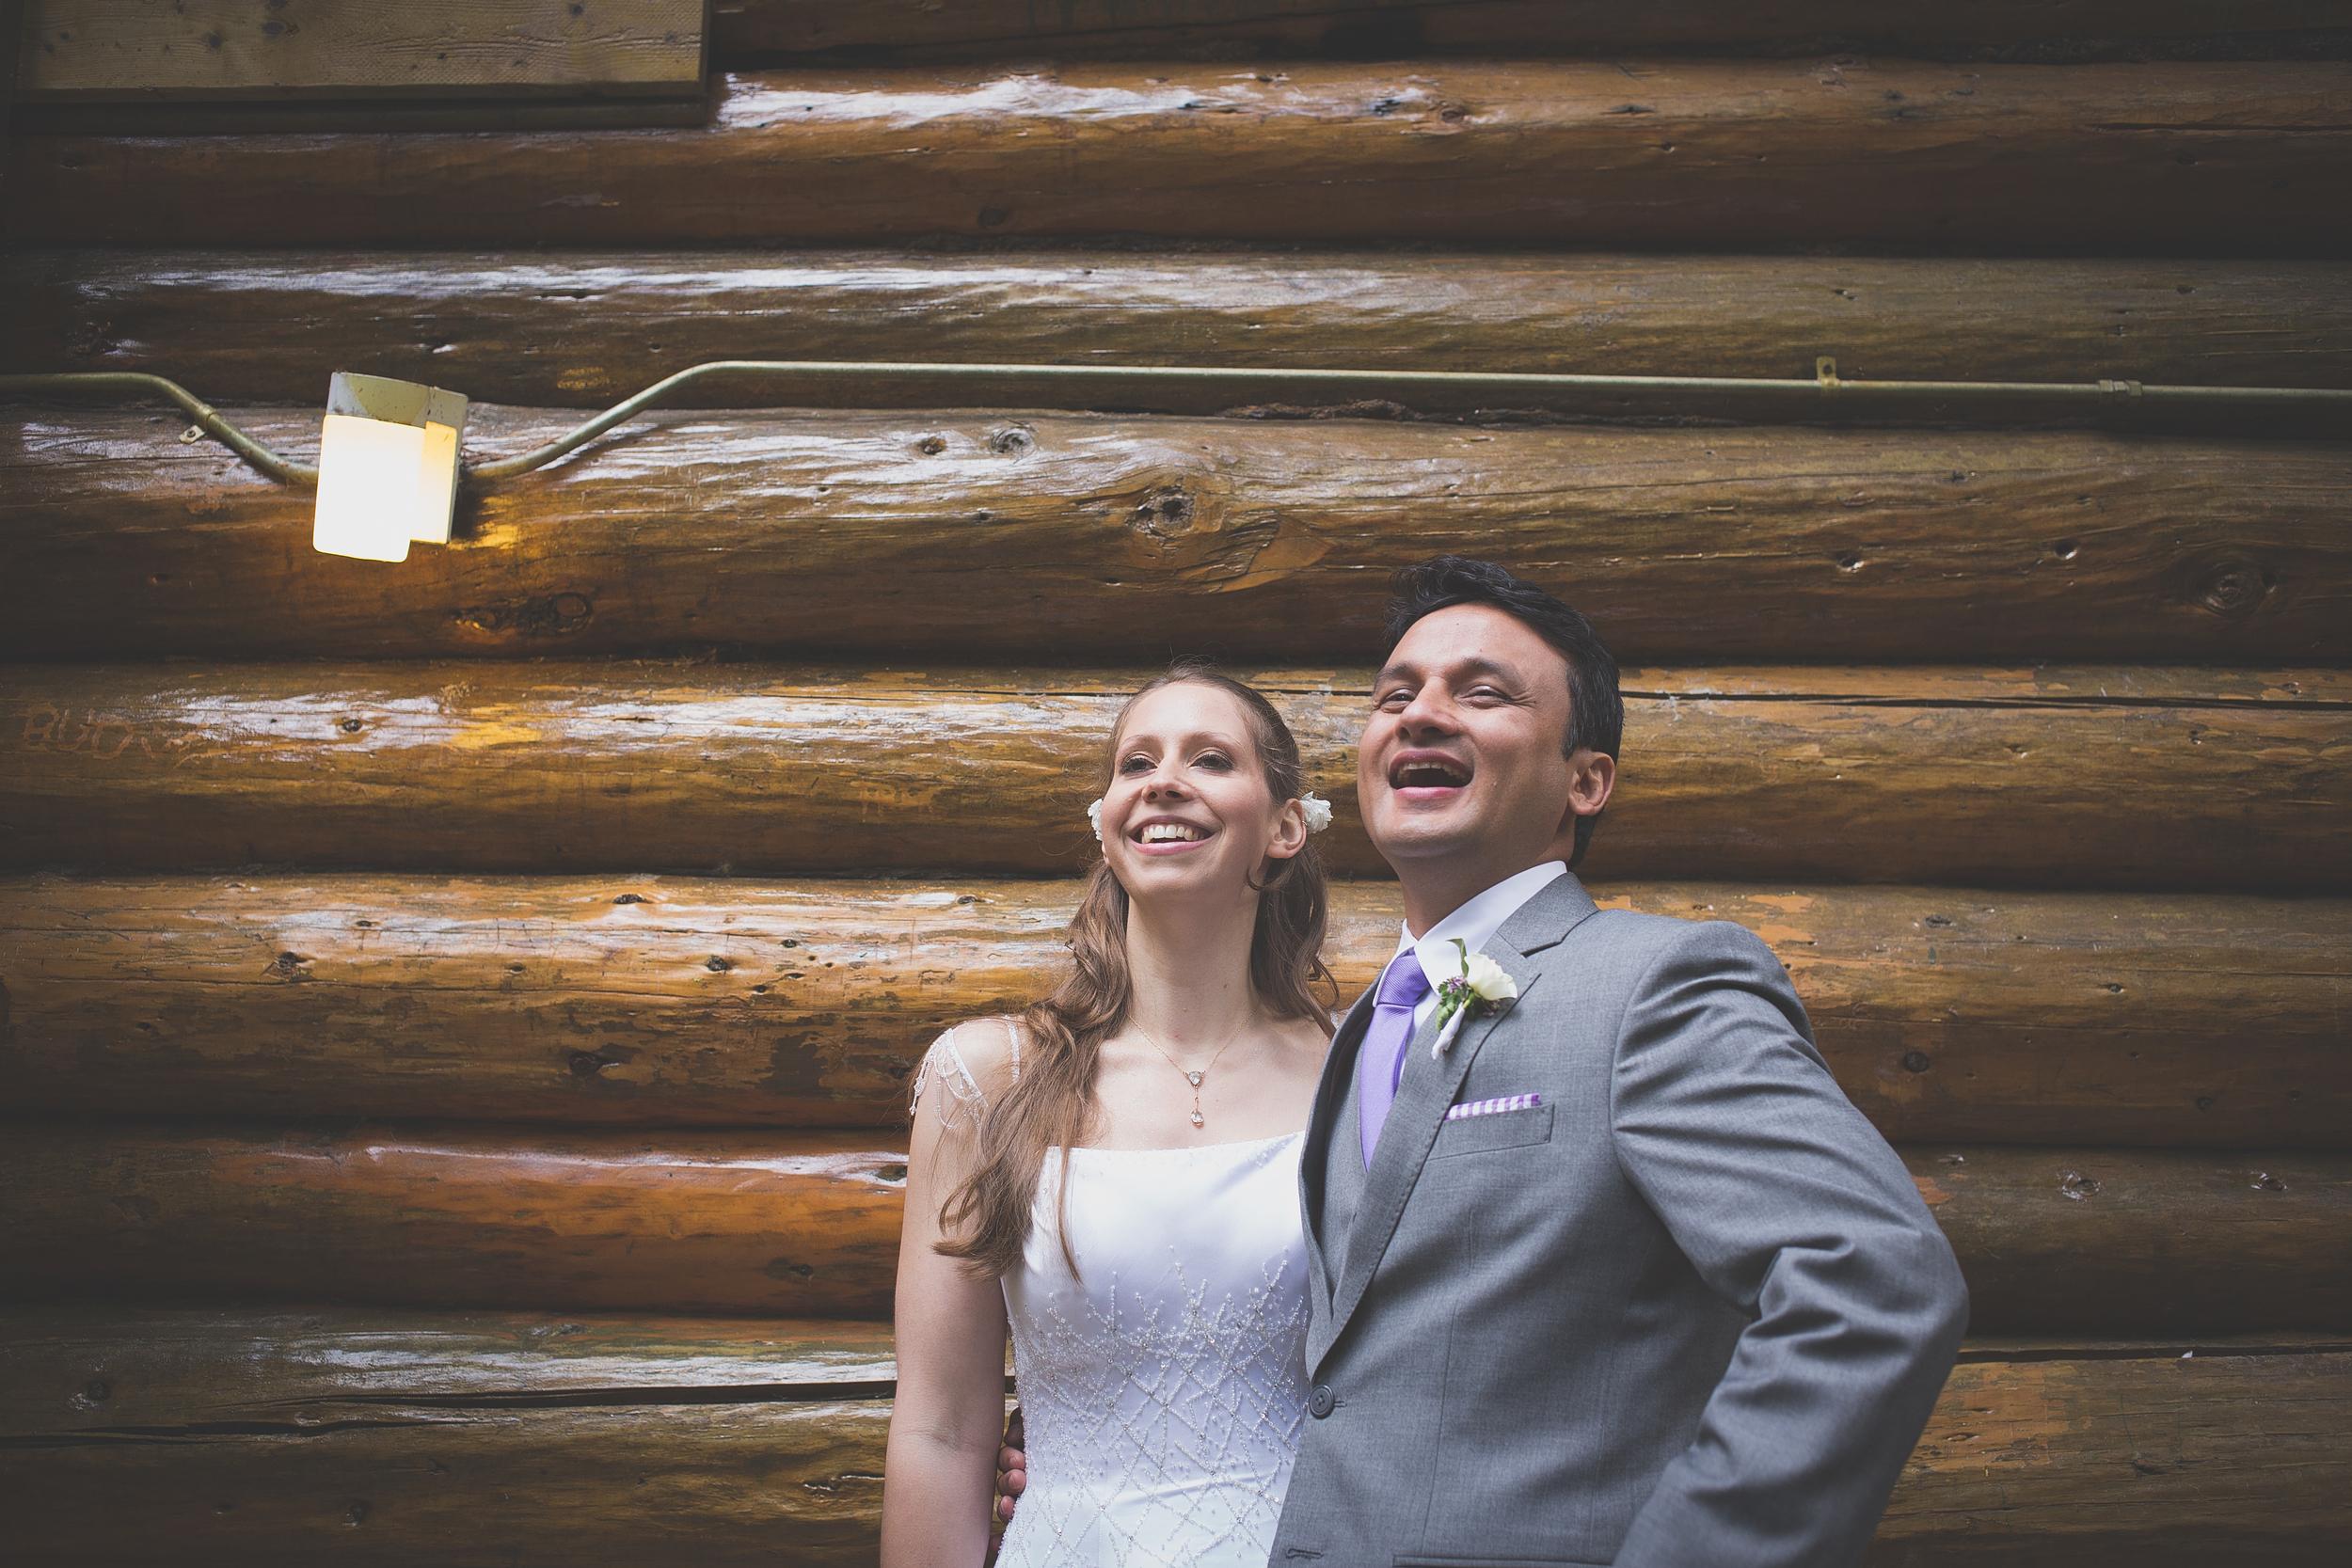 vancouver_photographer_wedding_DogwoodPhotography-32.jpg